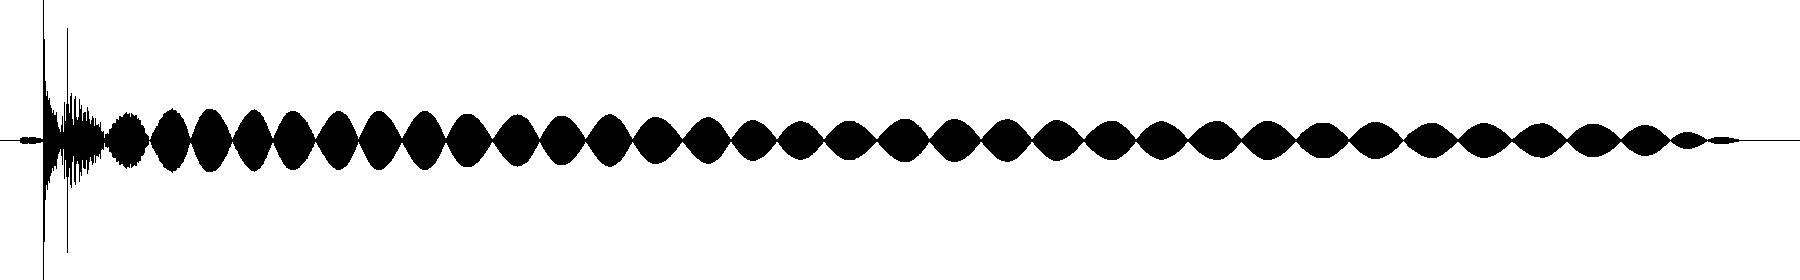 perc 1 52